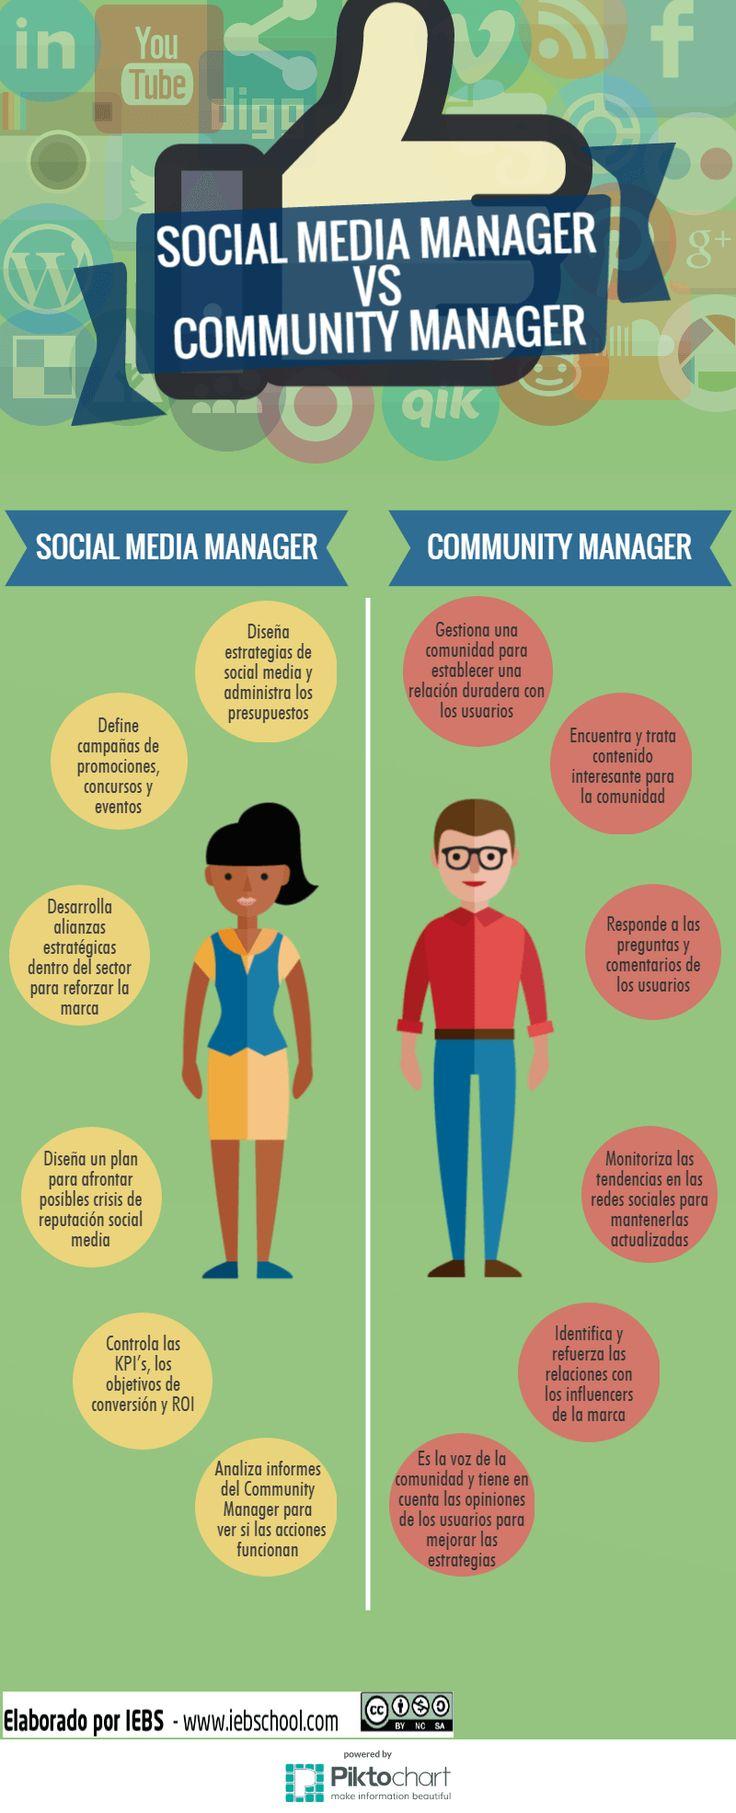 #Socialmedia Manager vs Community Manager   #infografia - http://buff.ly/1KEkTVx